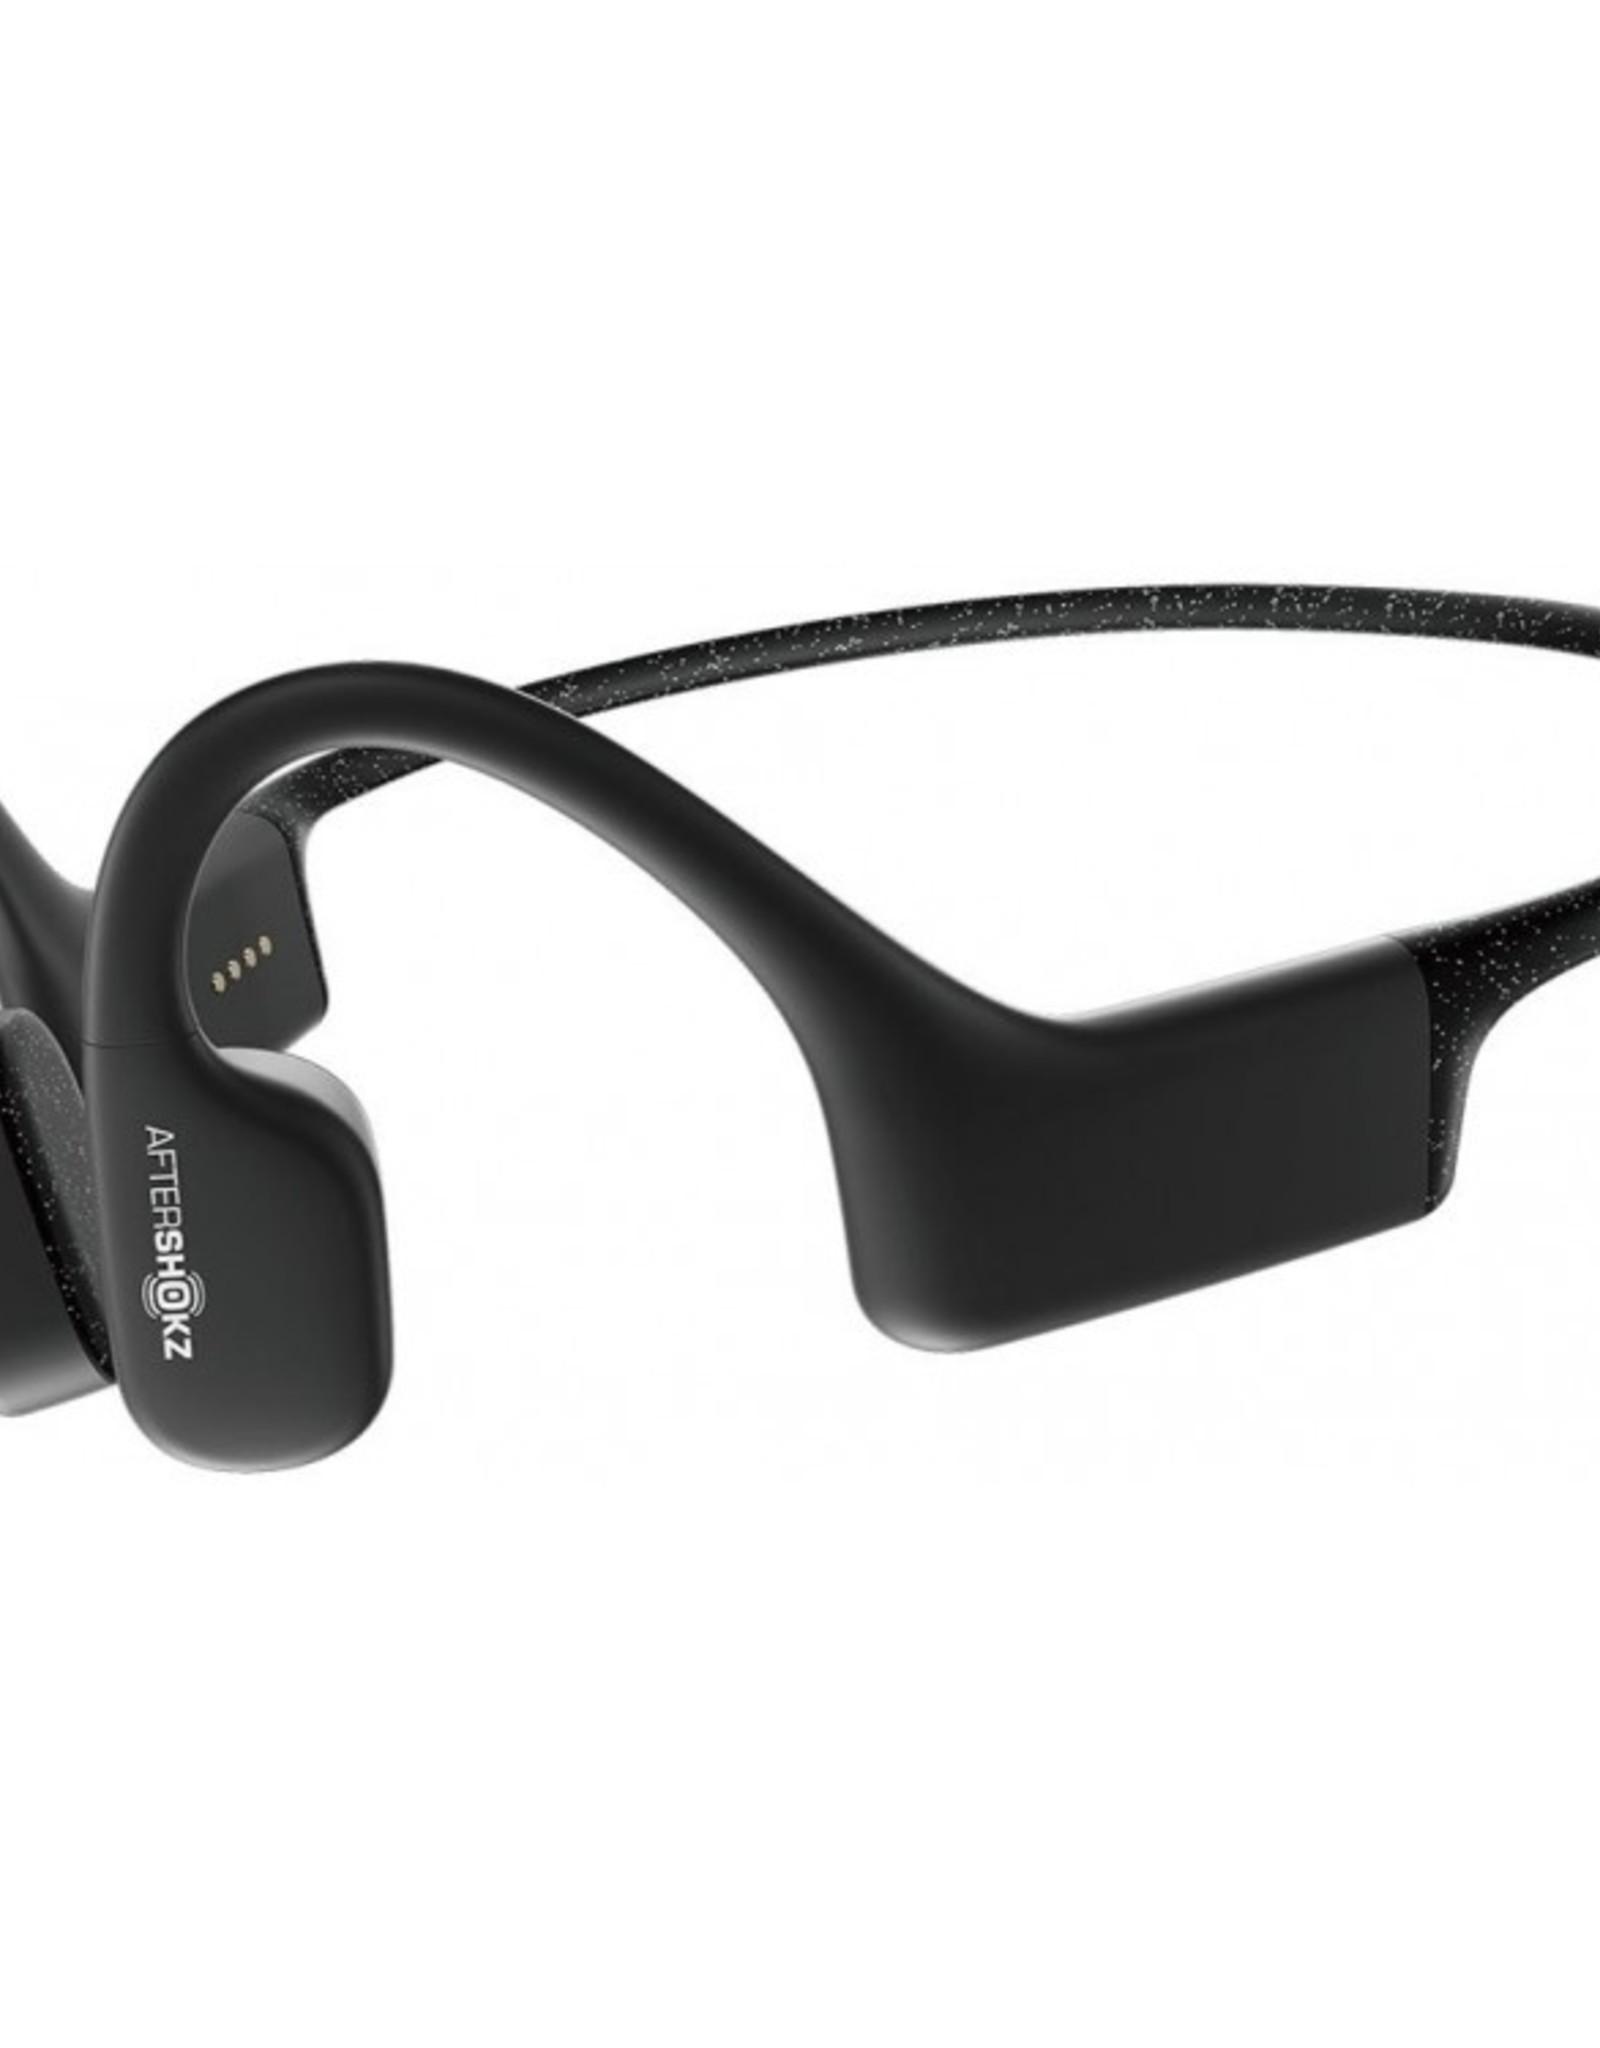 Aftershokz Aftershokz | Xtrainerz Headphone Waterproof MP3 Black Diamond AS700BD